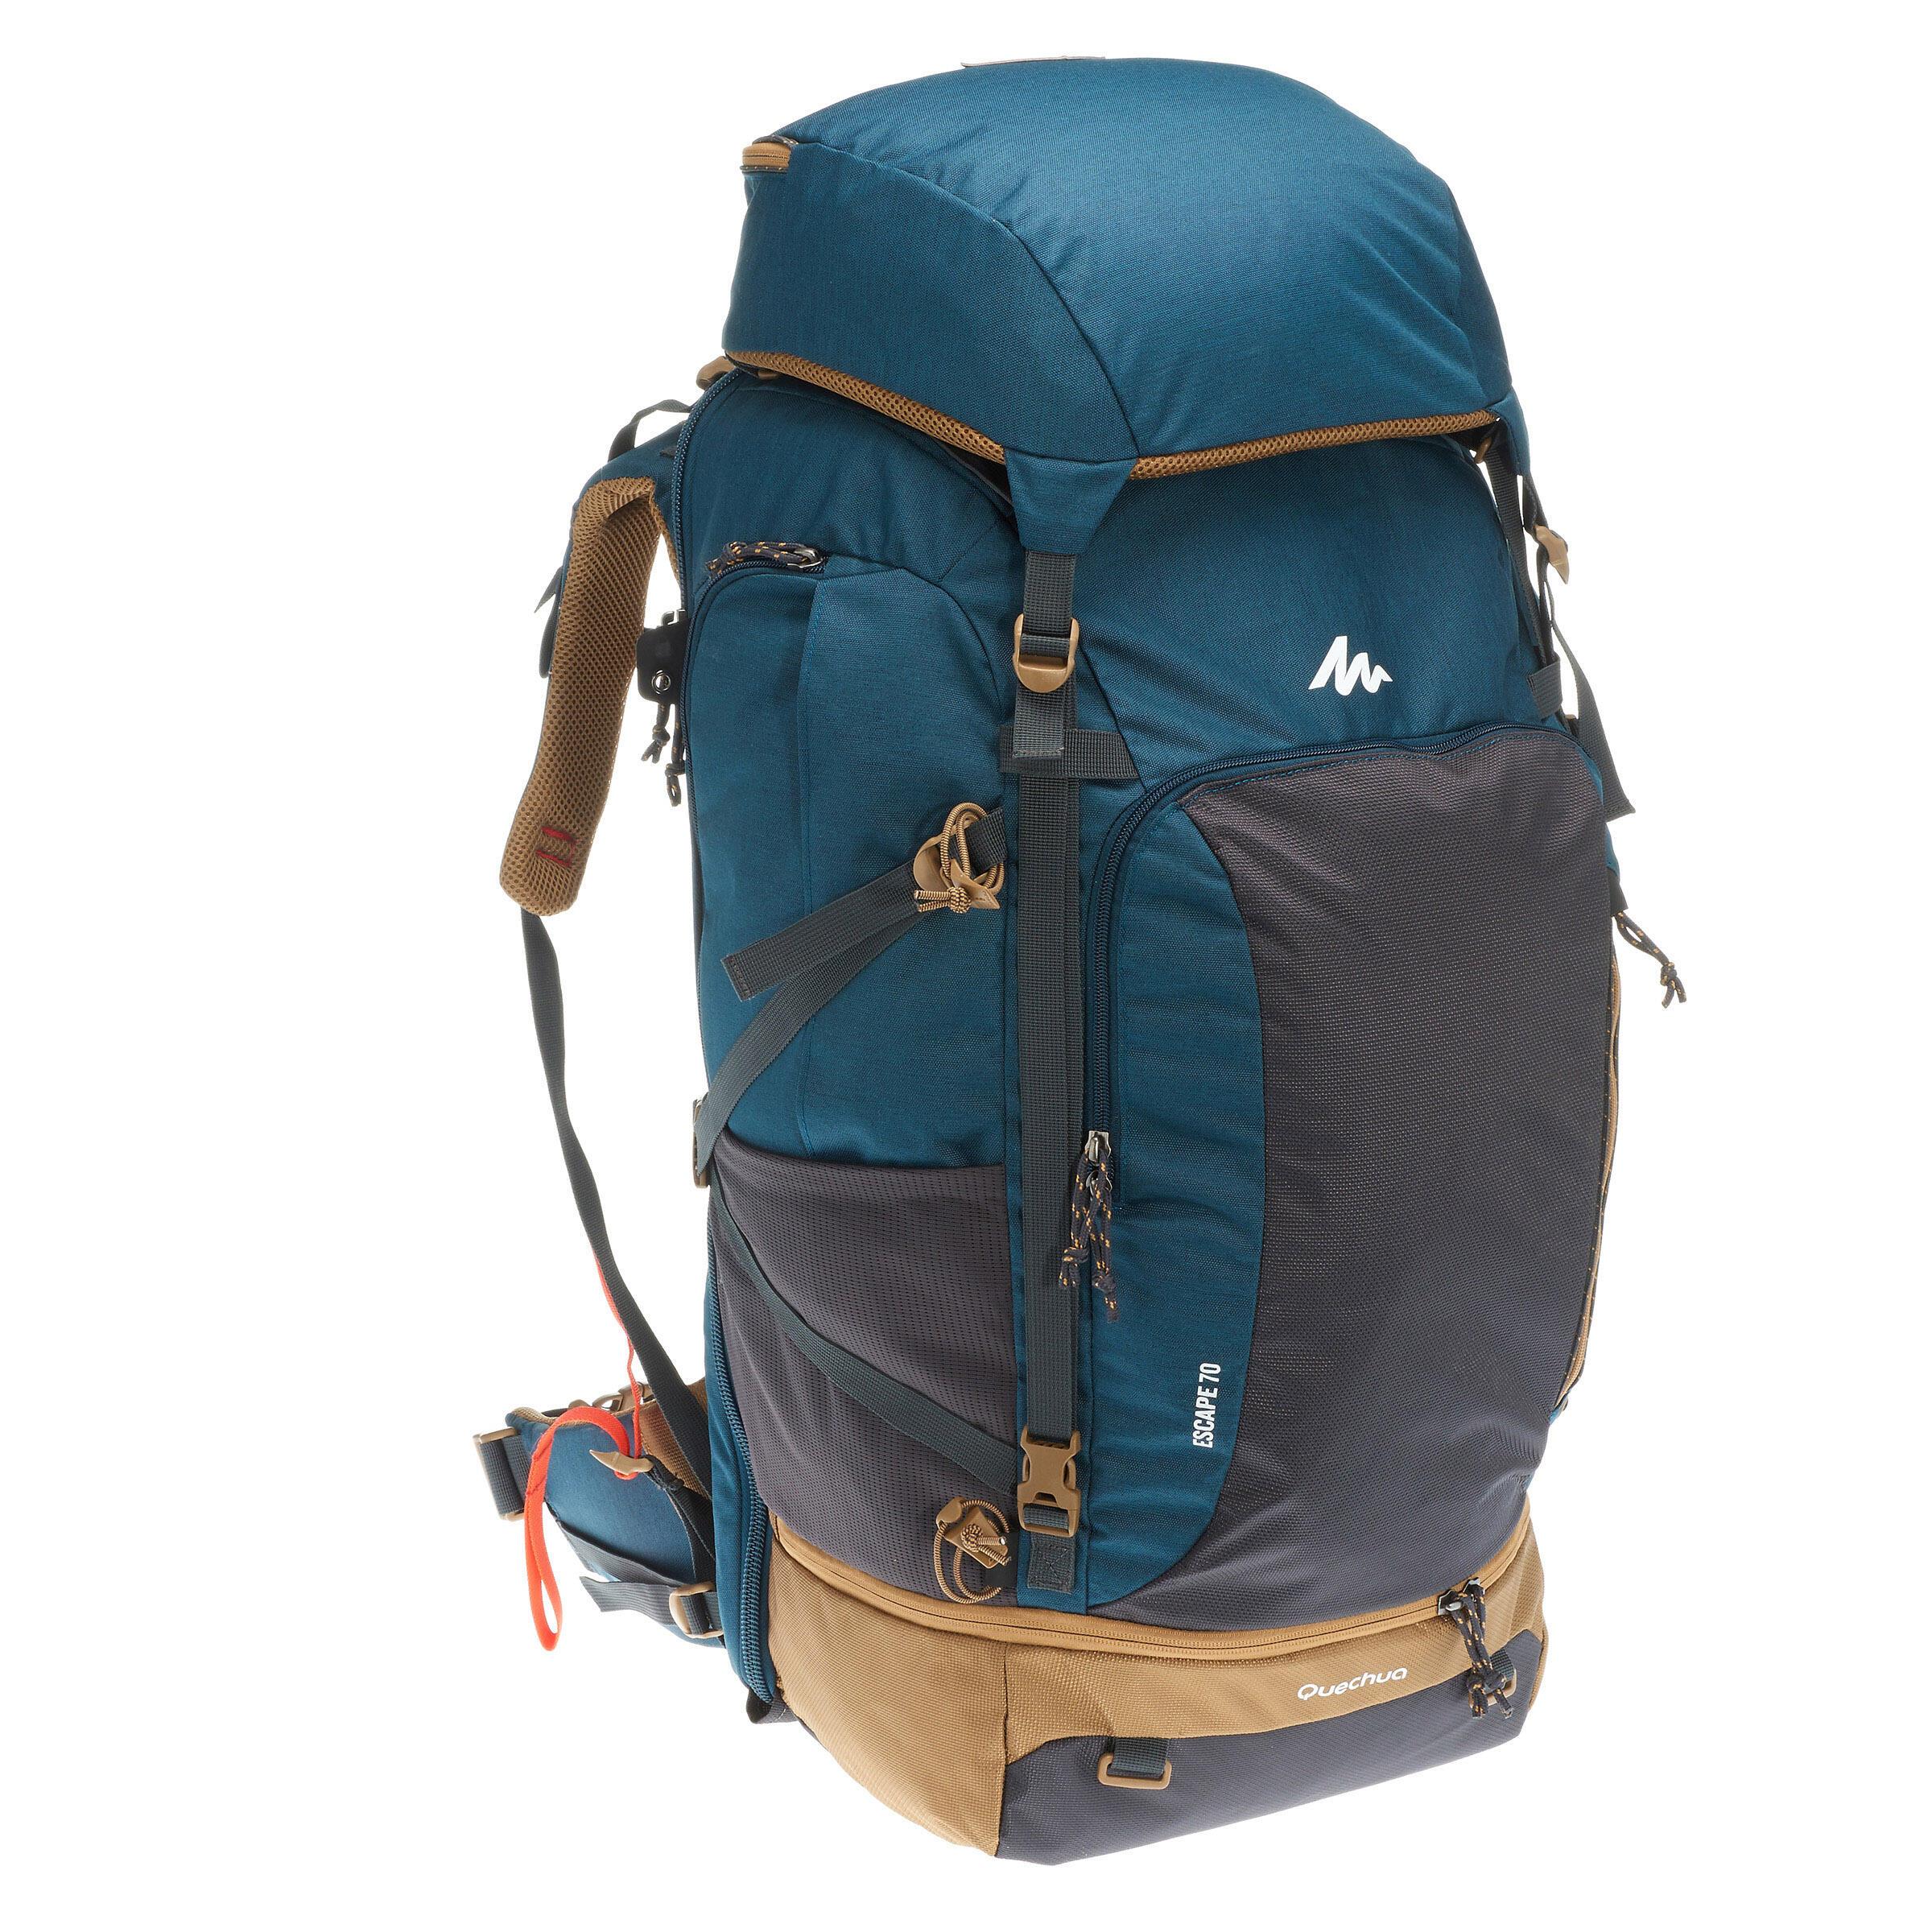 forclaz sac dos trekking travel 500 homme 70 litres cadenassable bleu decathlon. Black Bedroom Furniture Sets. Home Design Ideas